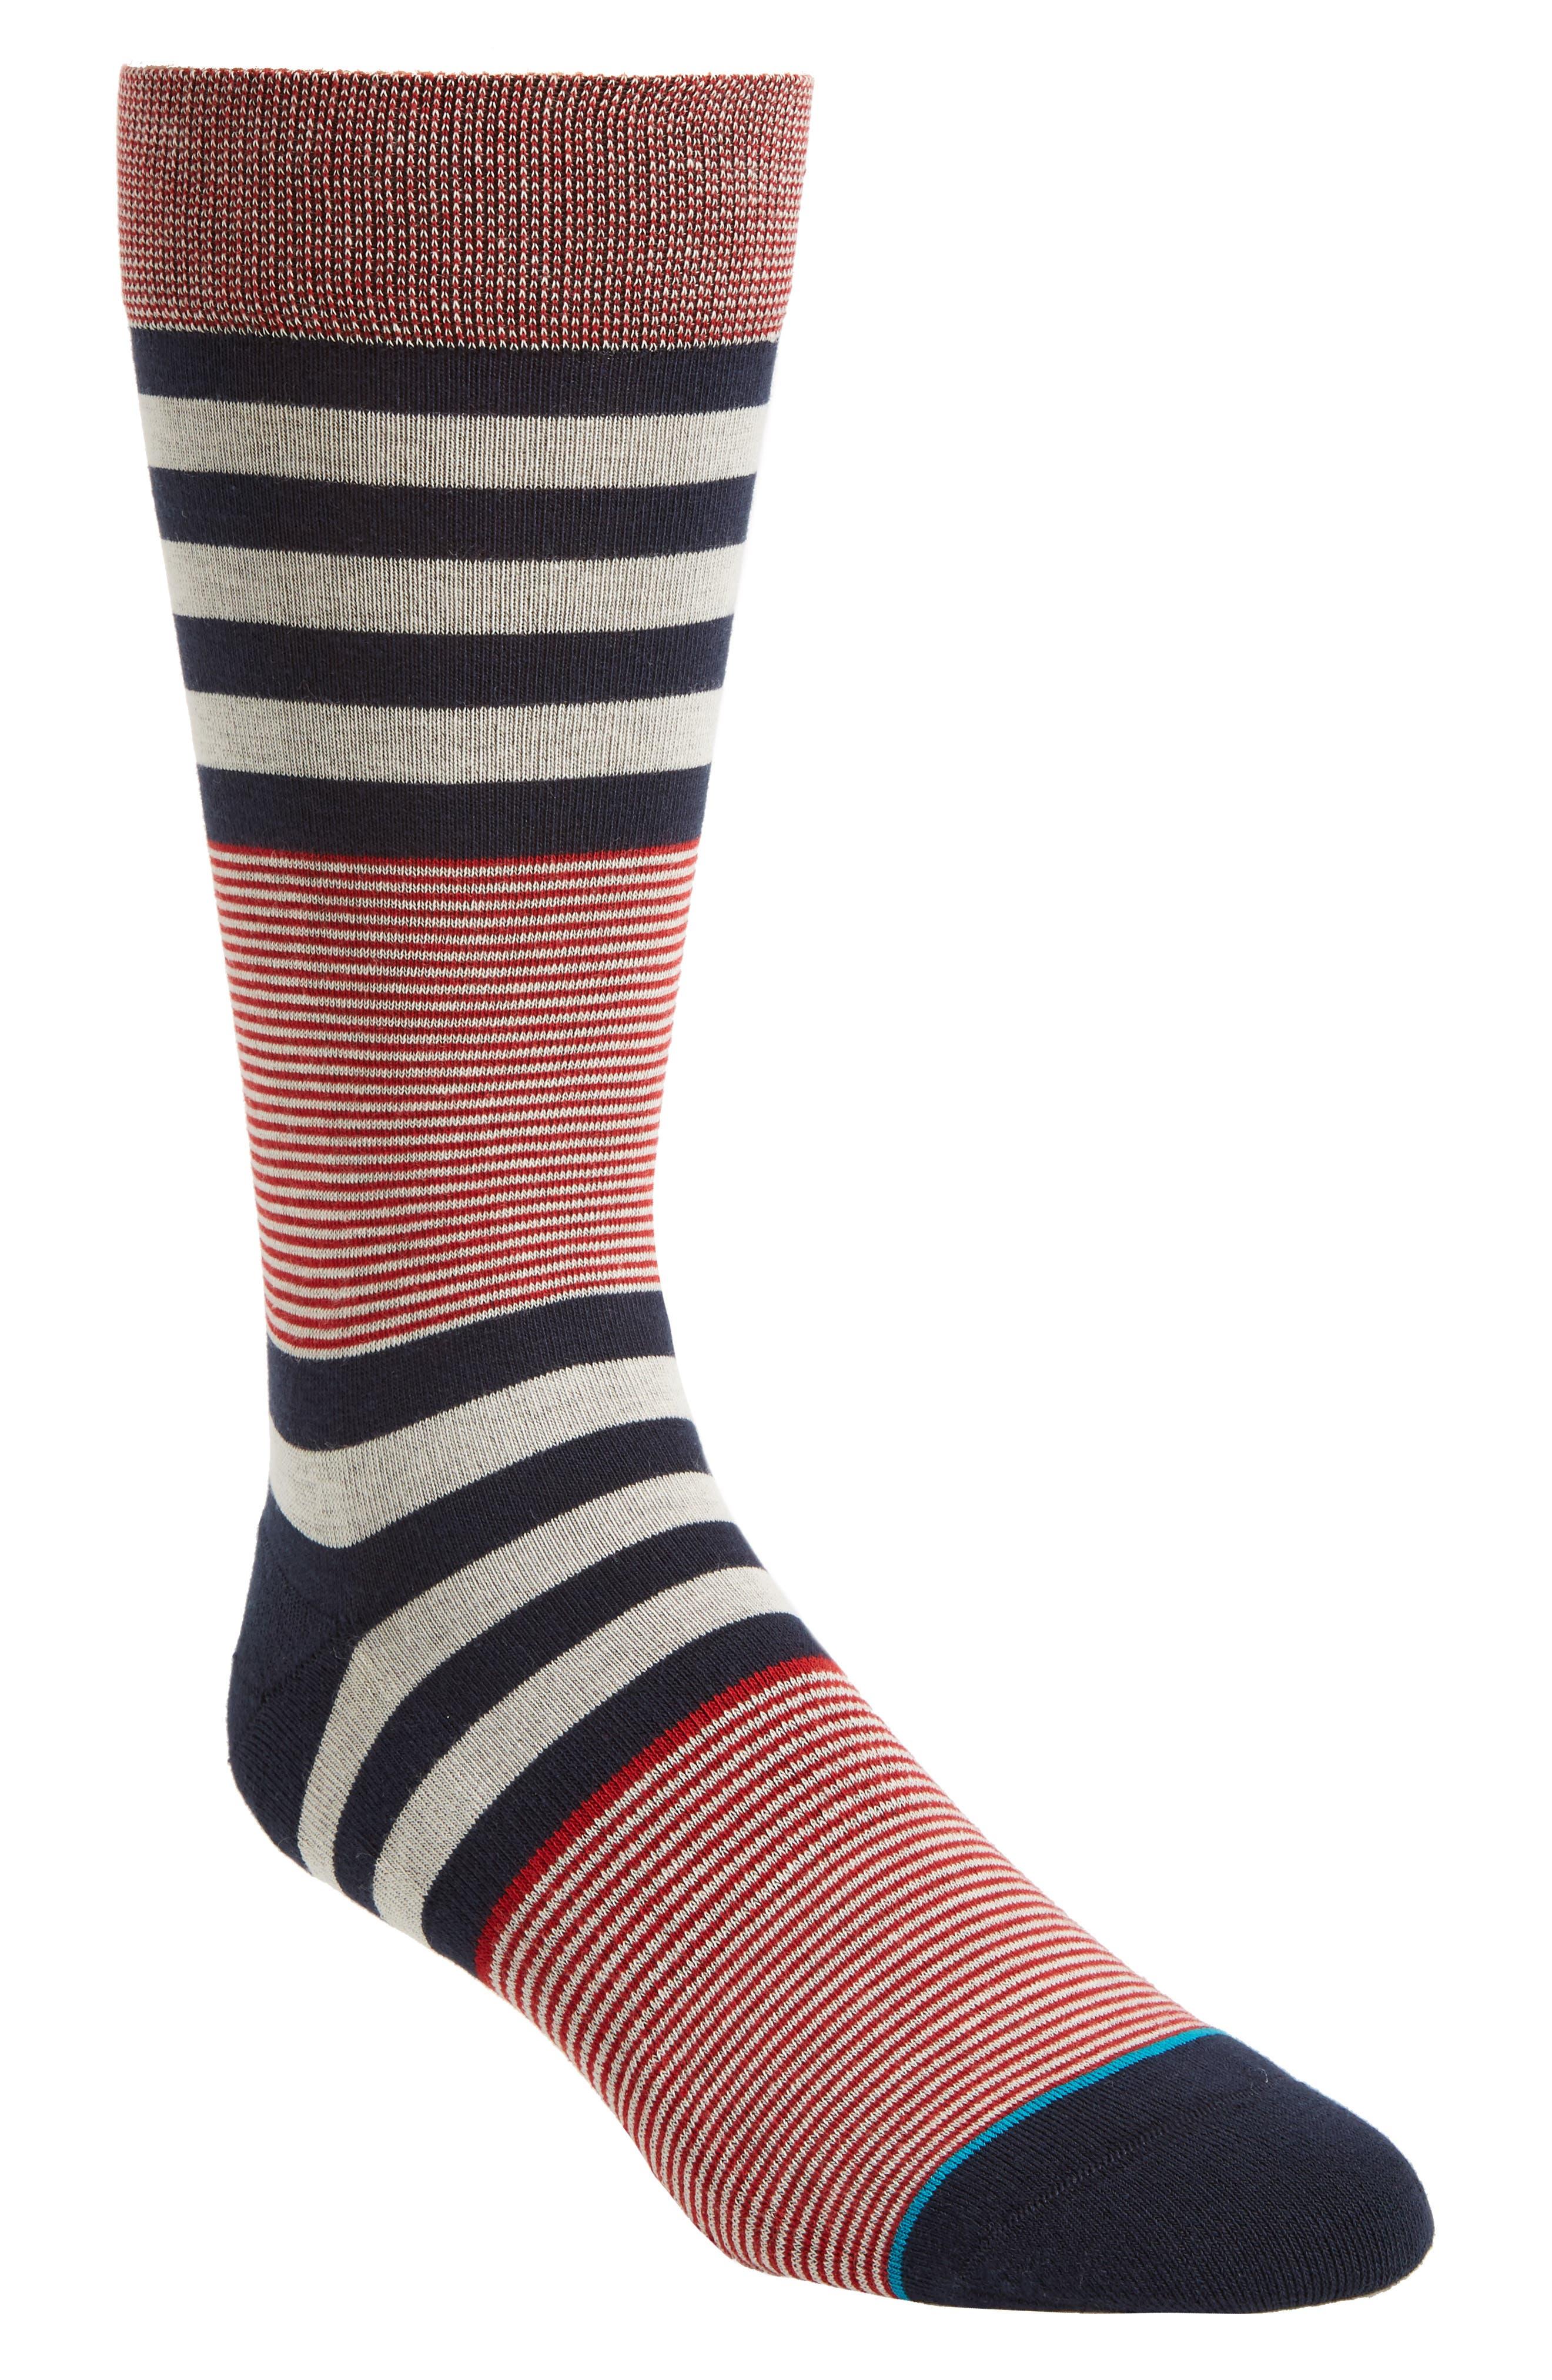 Americanas Socks,                             Main thumbnail 1, color,                             Black